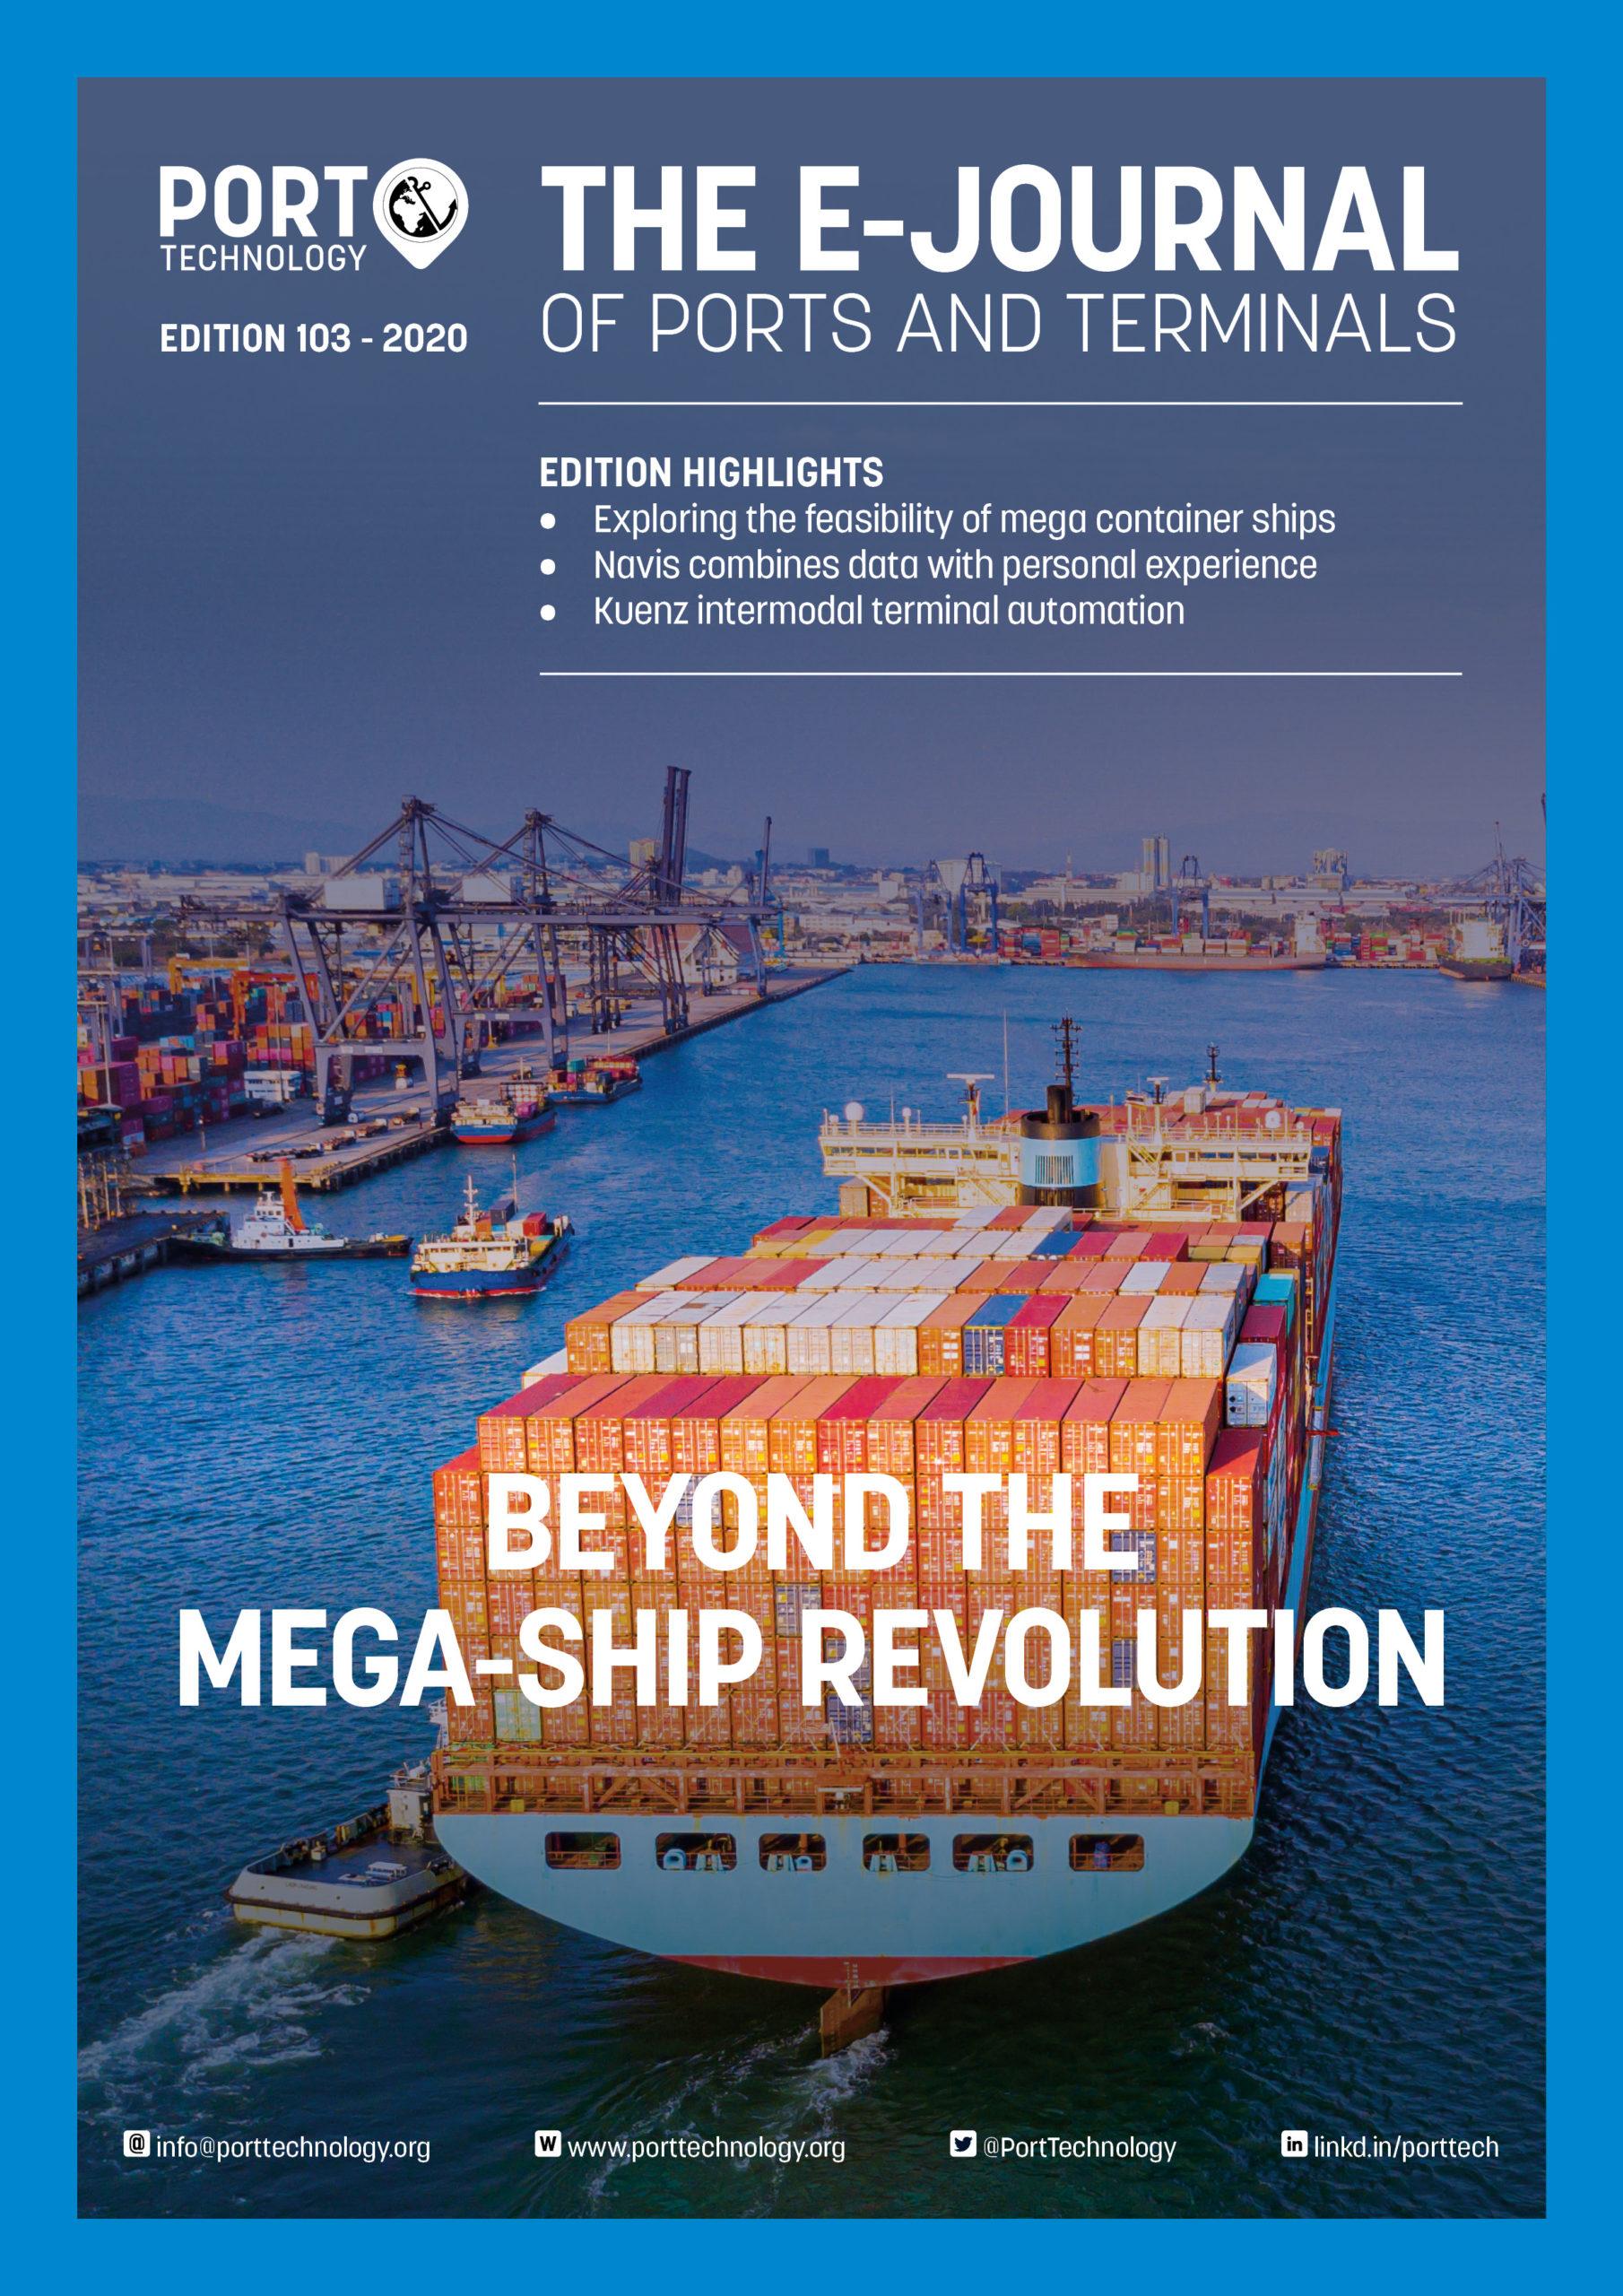 Beyond the Mega-Ship Revolution